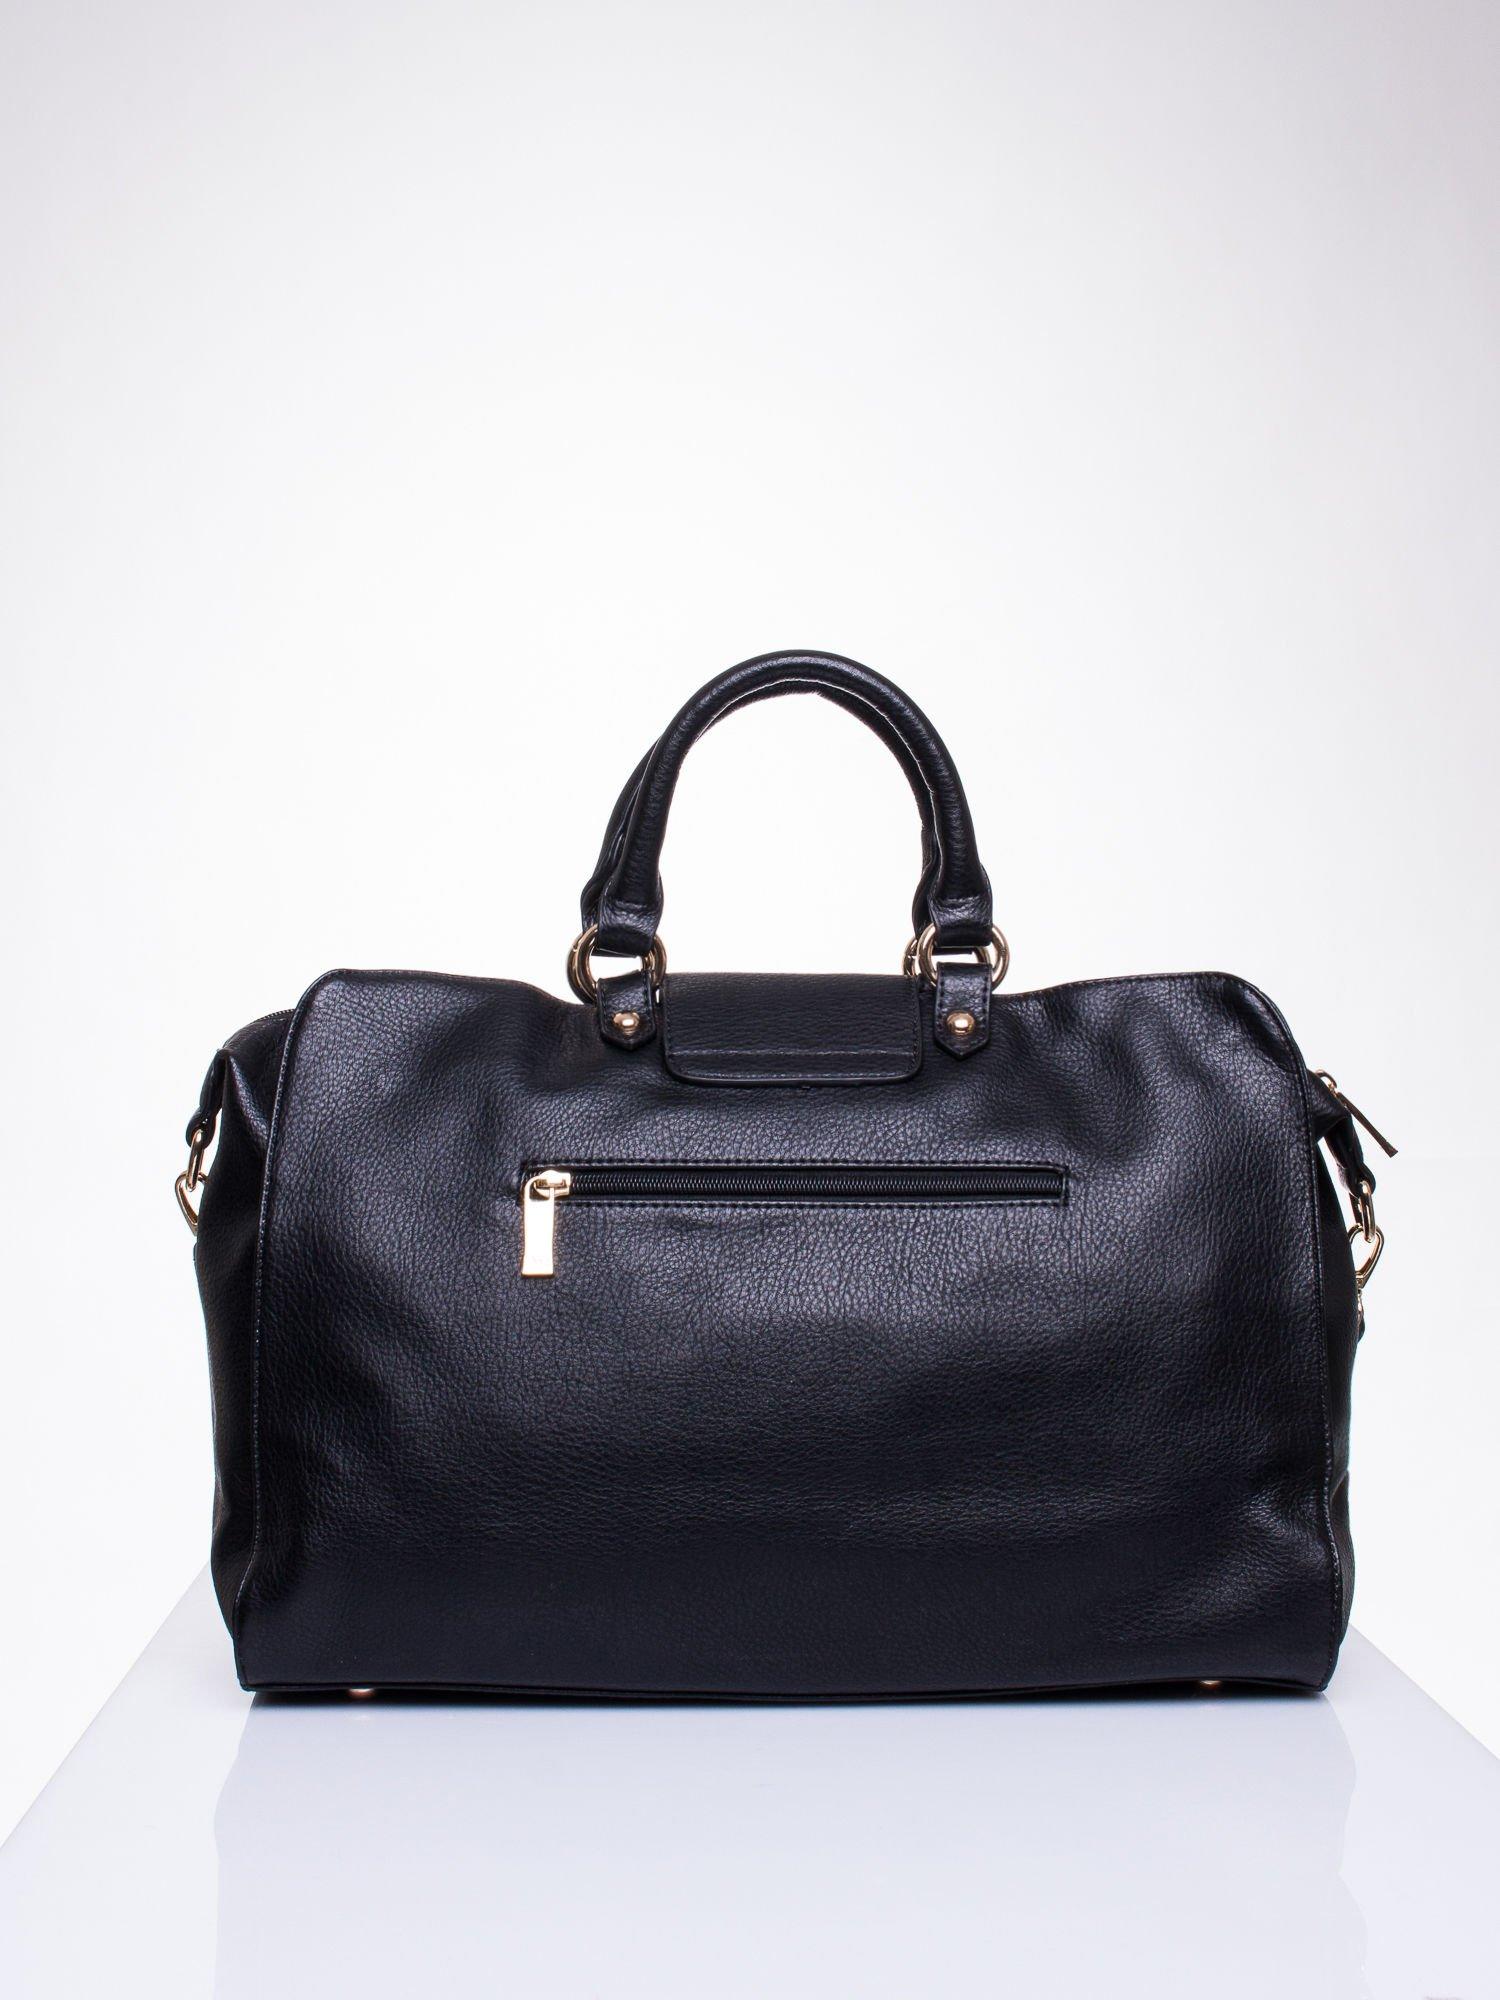 Czarna torba kuferek z klapką                                  zdj.                                  2